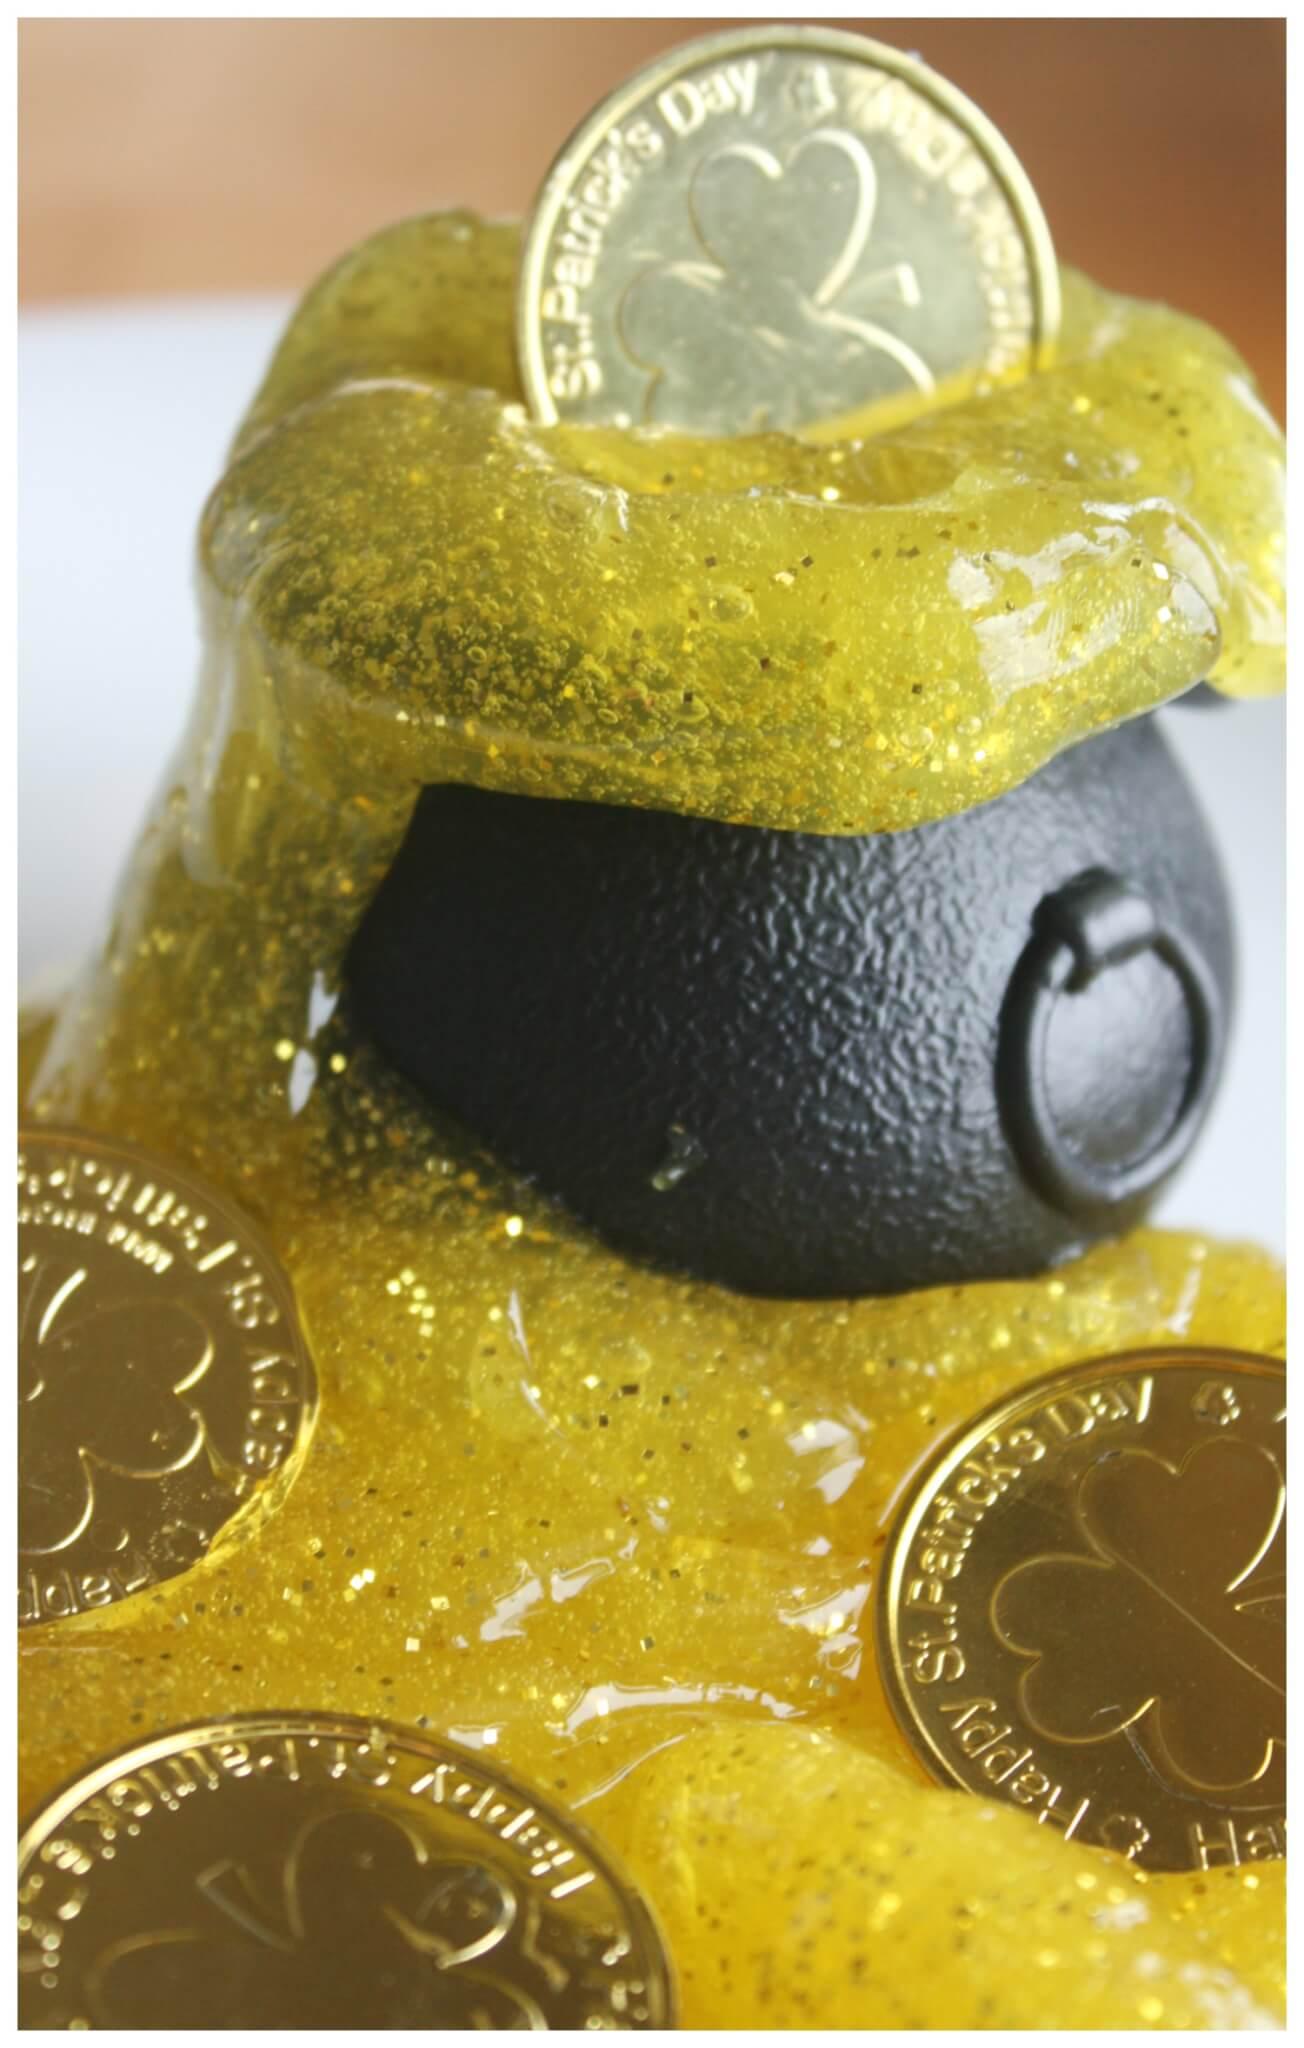 Gold Sparkle Slime Spring Sensory Play Activity